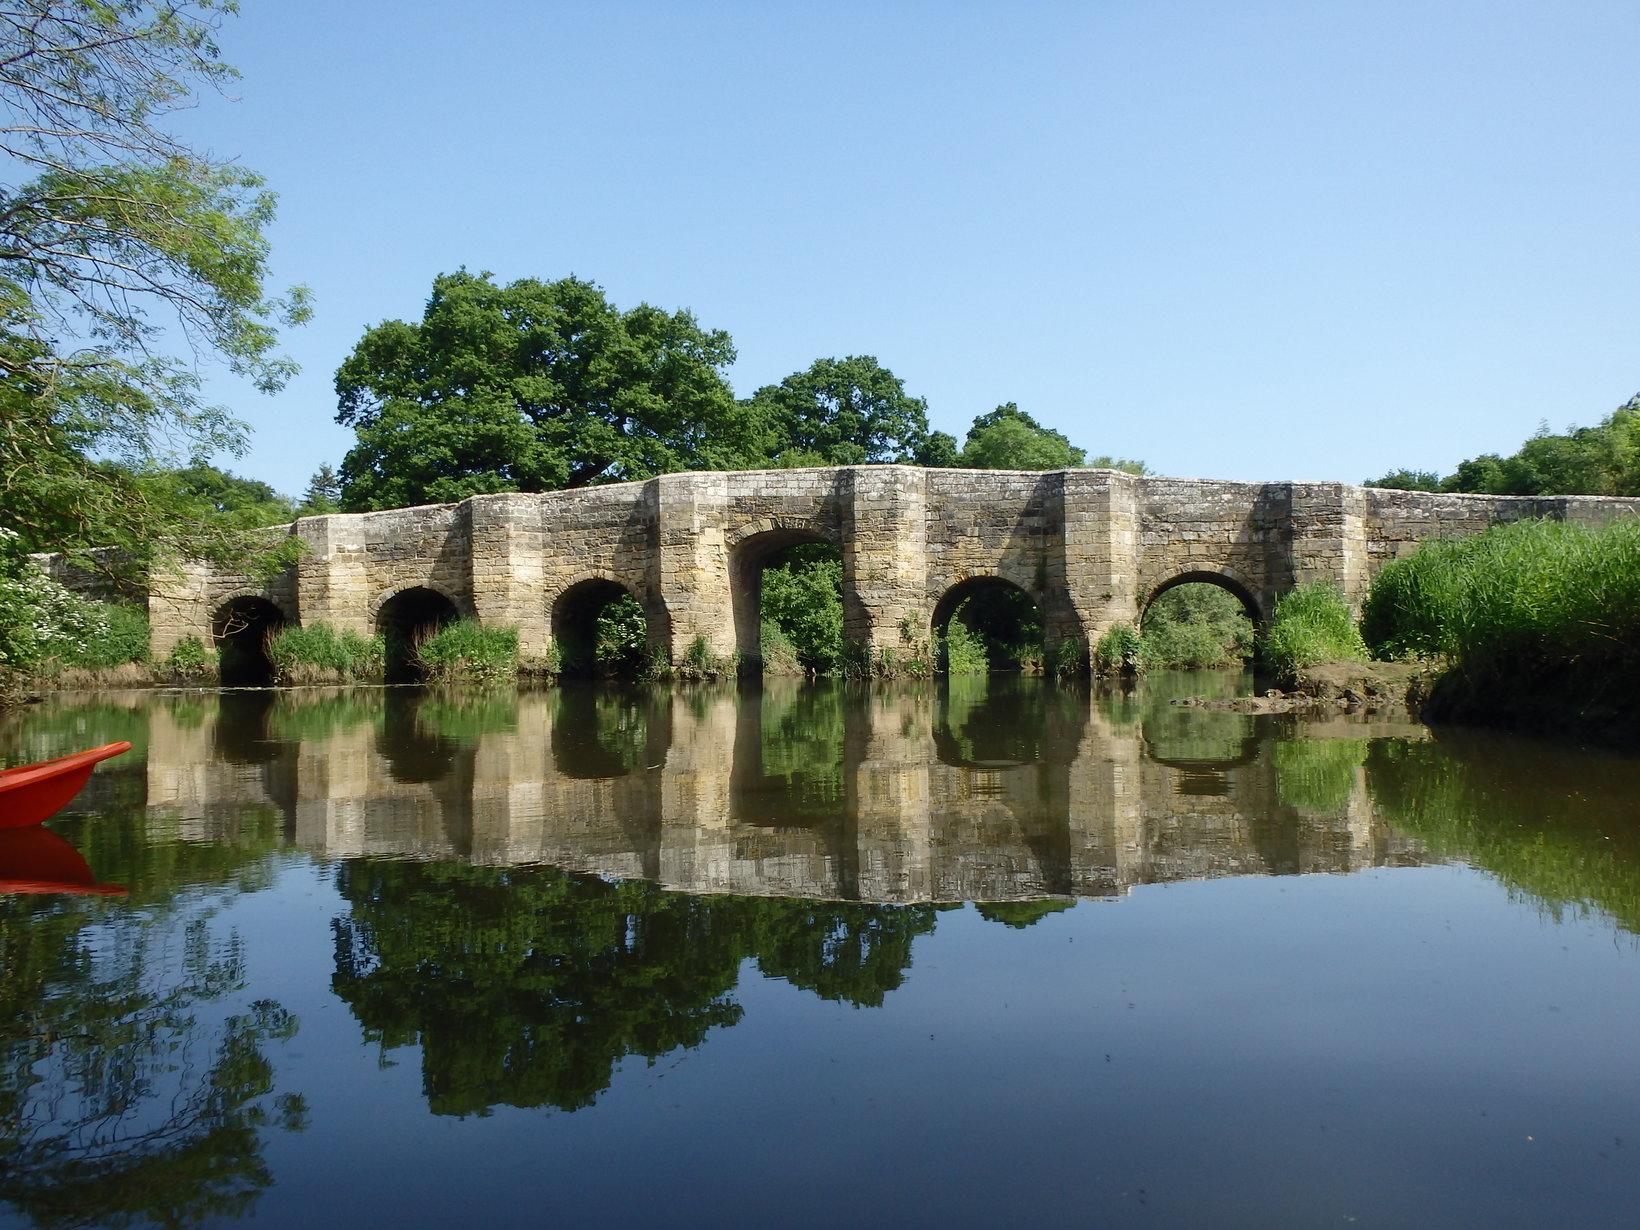 Stopham bridge on the River Arun